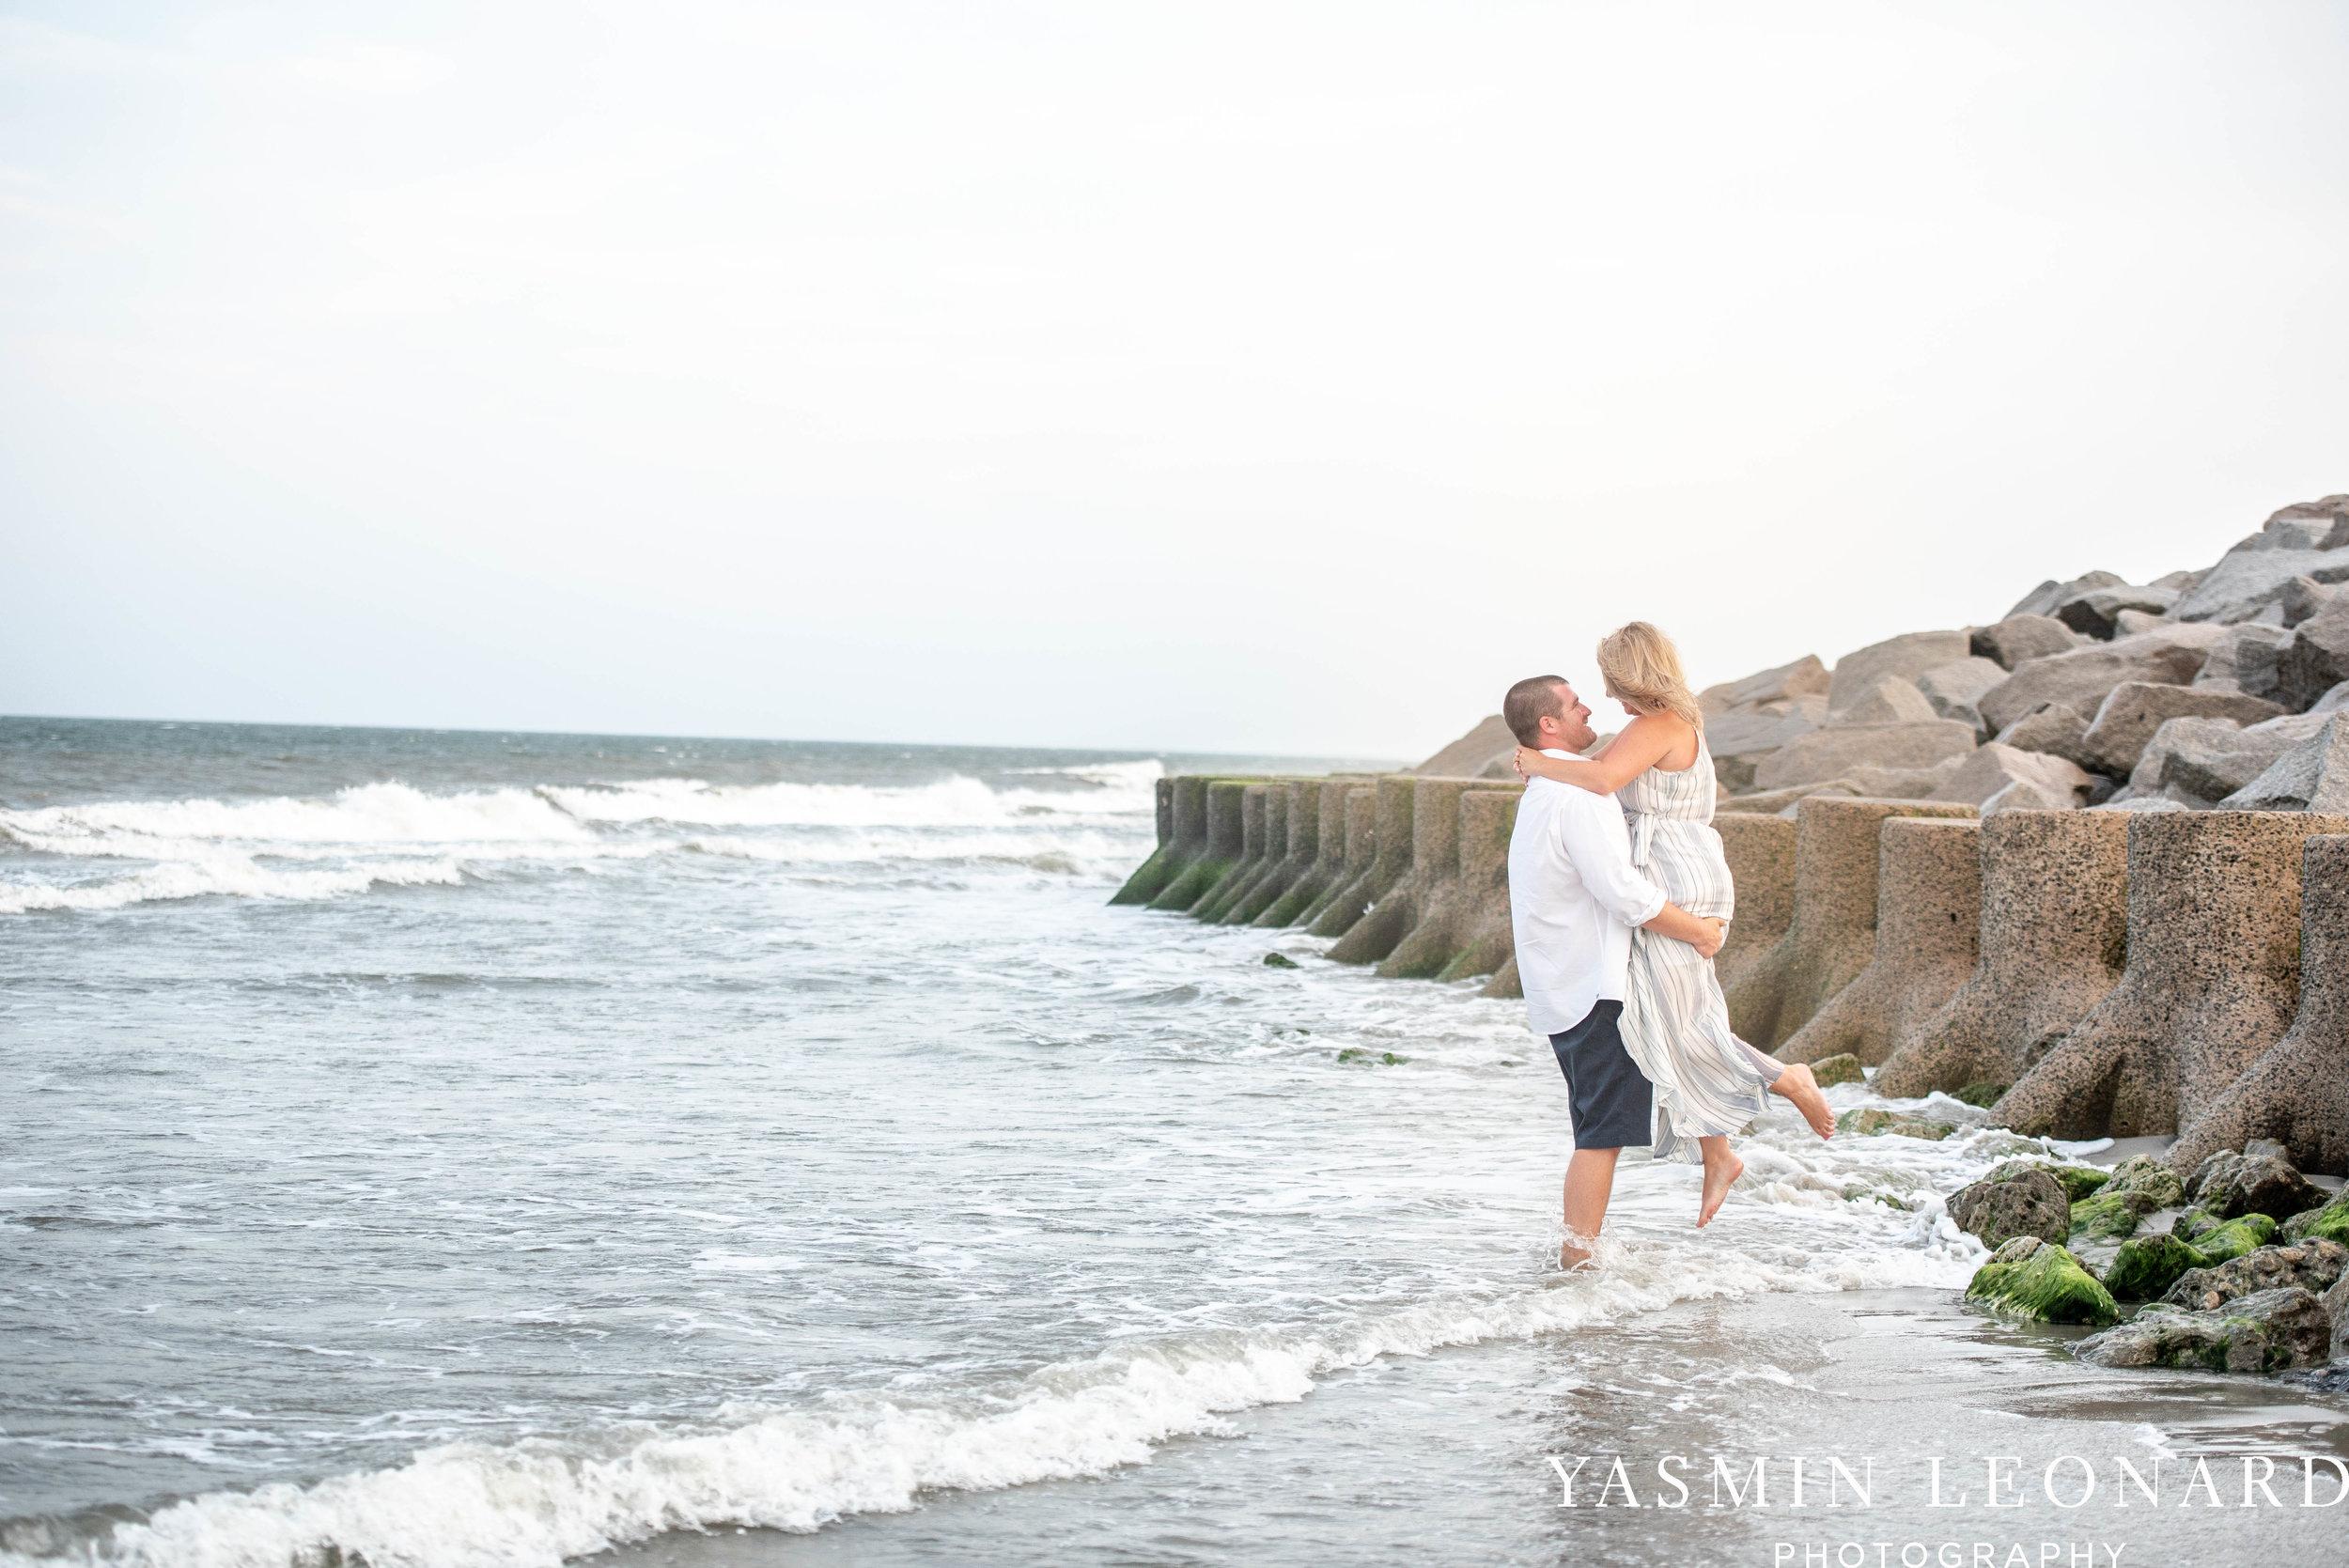 Carolina Beach Engagement Session - Kure Beach - Fort Fisher Engagement Session - Beach Engagement Session - Wrightsville Beach Weddings - Weddings on the Beach - Wilmington NC - Yasmin Leonard Photography-12.jpg